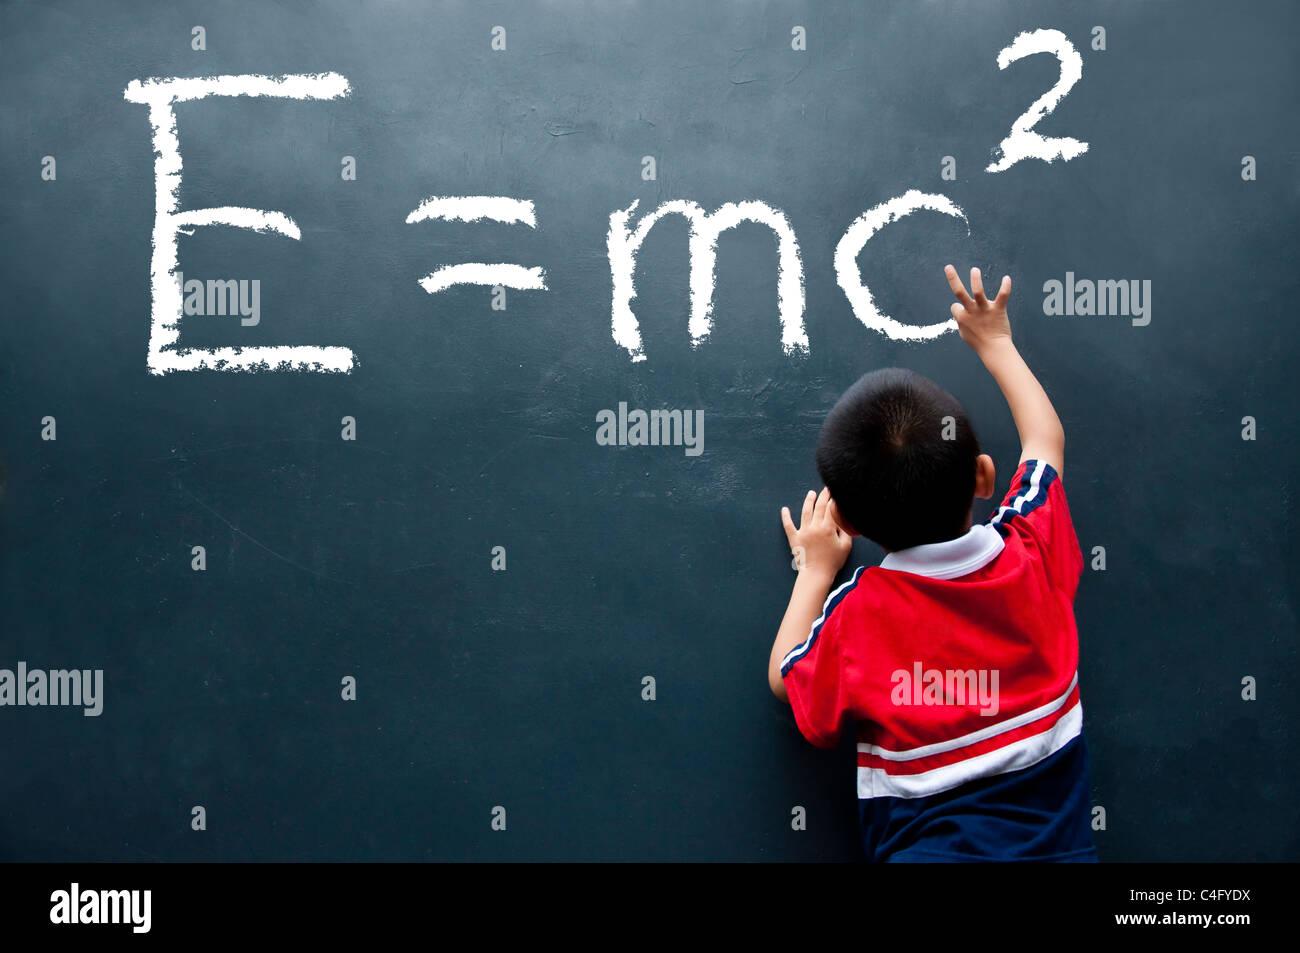 Dibujo chico E=mc2 en la pared Foto de stock